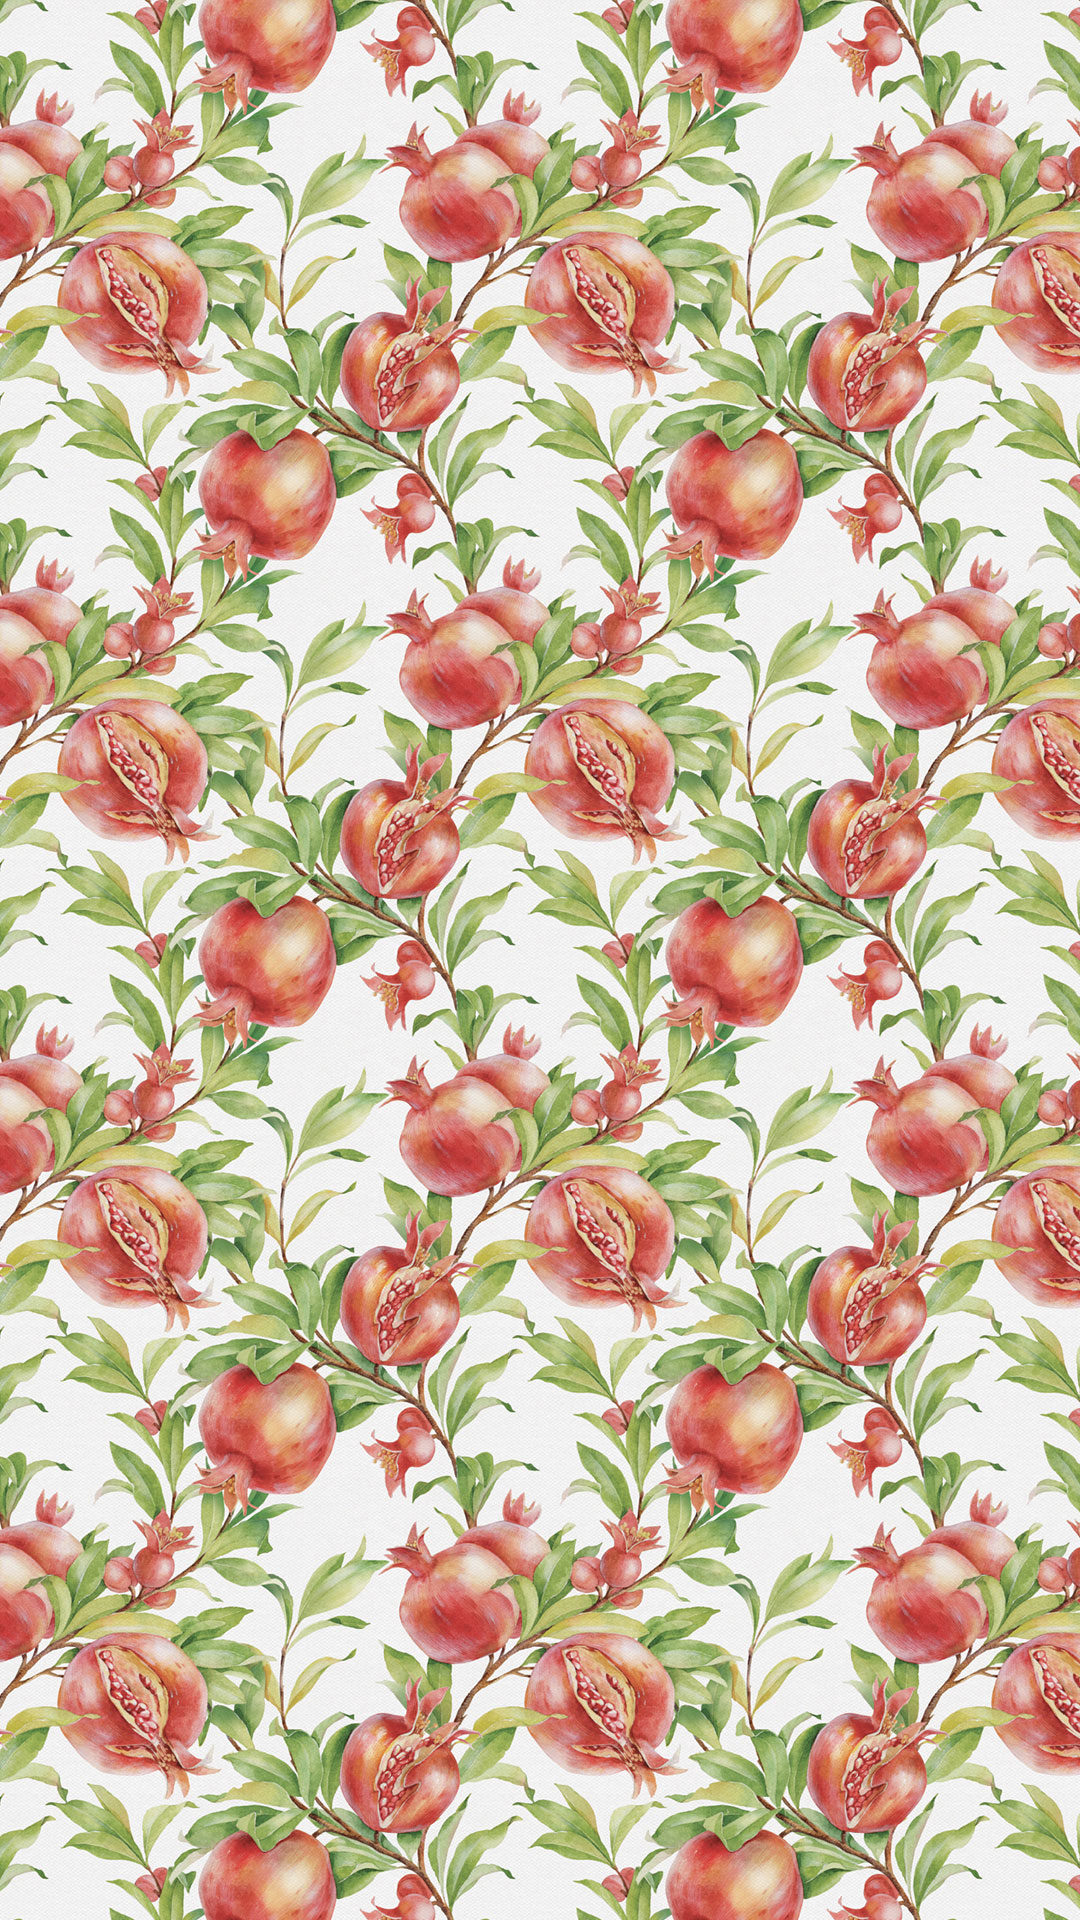 Vintage Flower Wallpaper Iphone 20 Cool Amp Beautiful Iphone 7 Plus Wallpapers